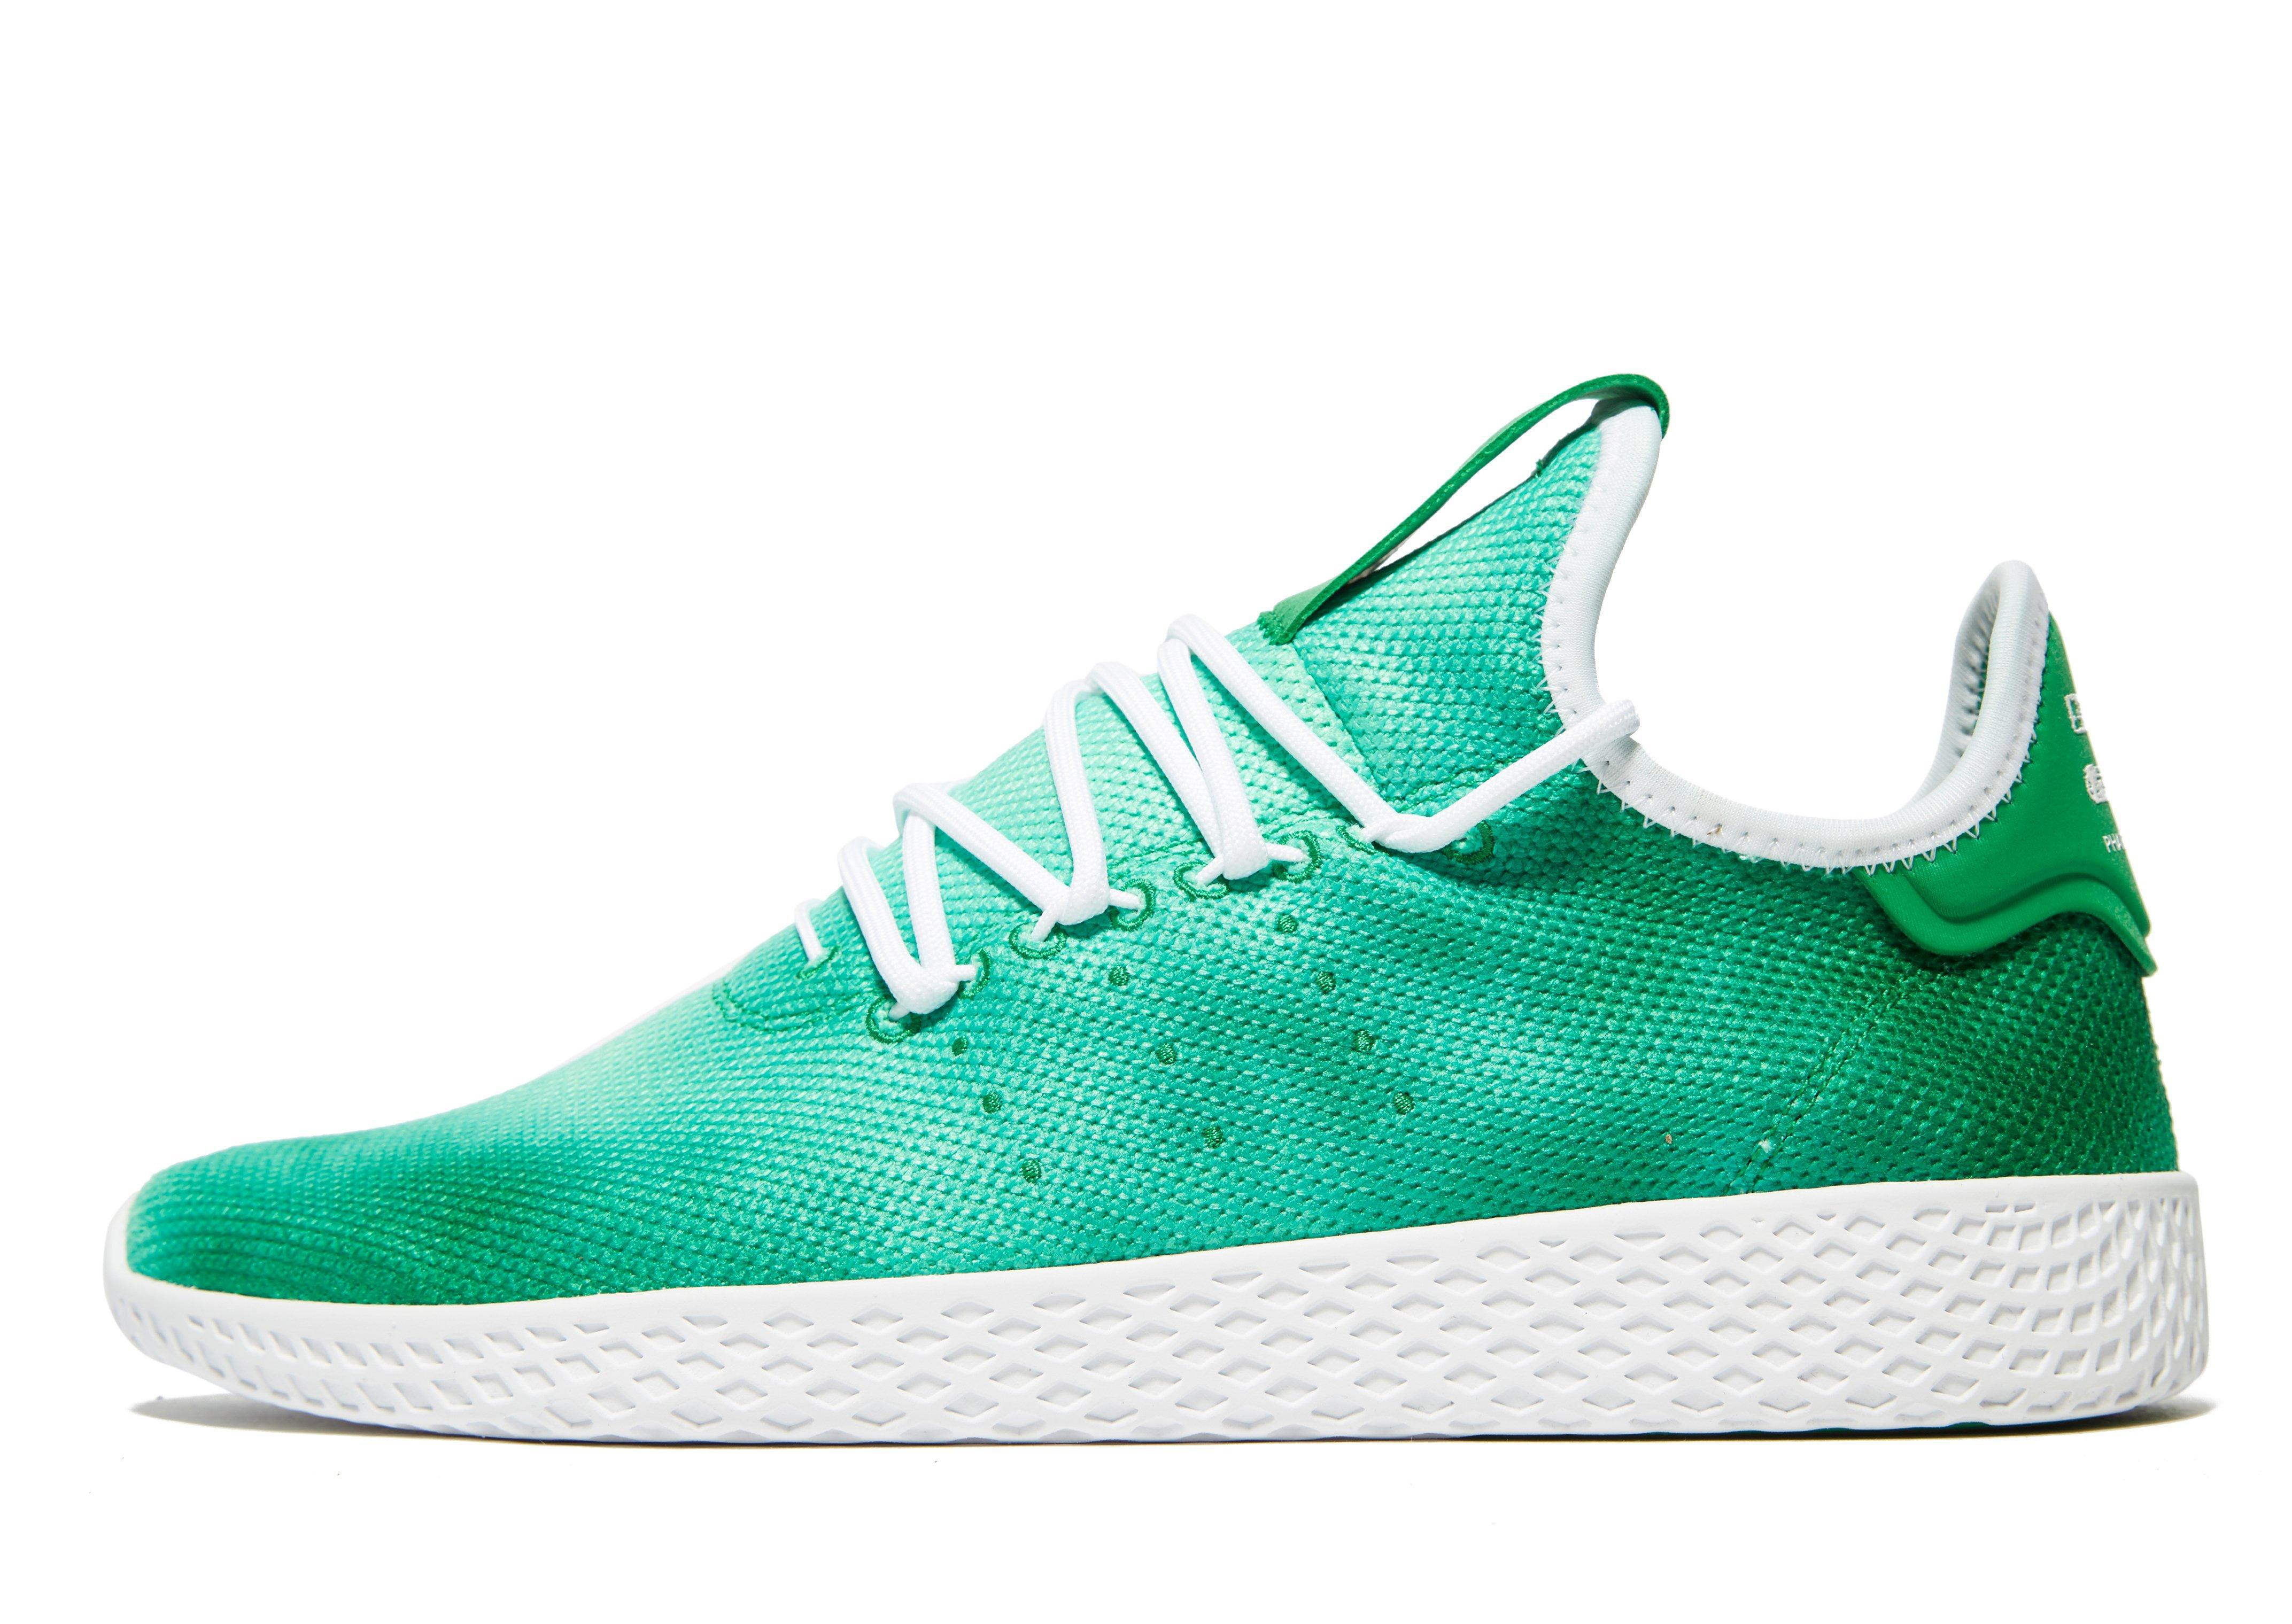 93d5e6ac6 Lyst - adidas Originals X Pharrell Williams Holi Tennis Hu in Green ...